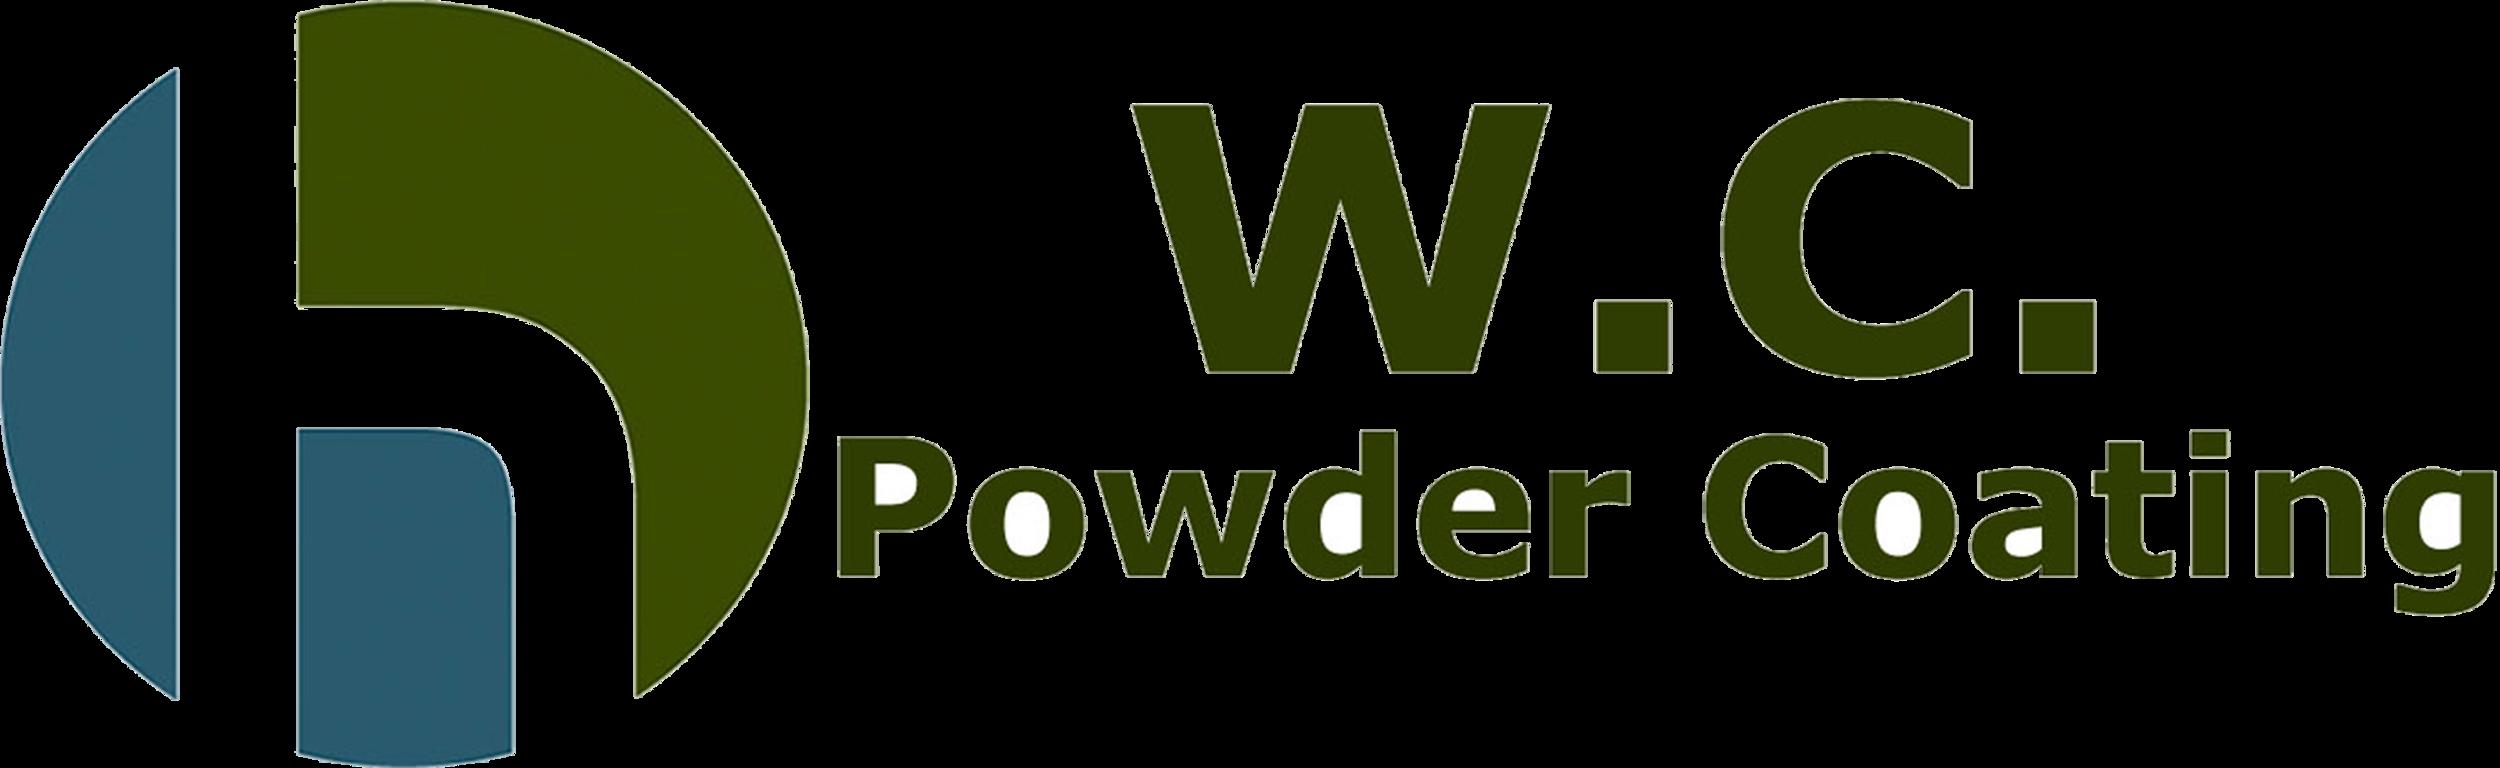 coating logo 2.png